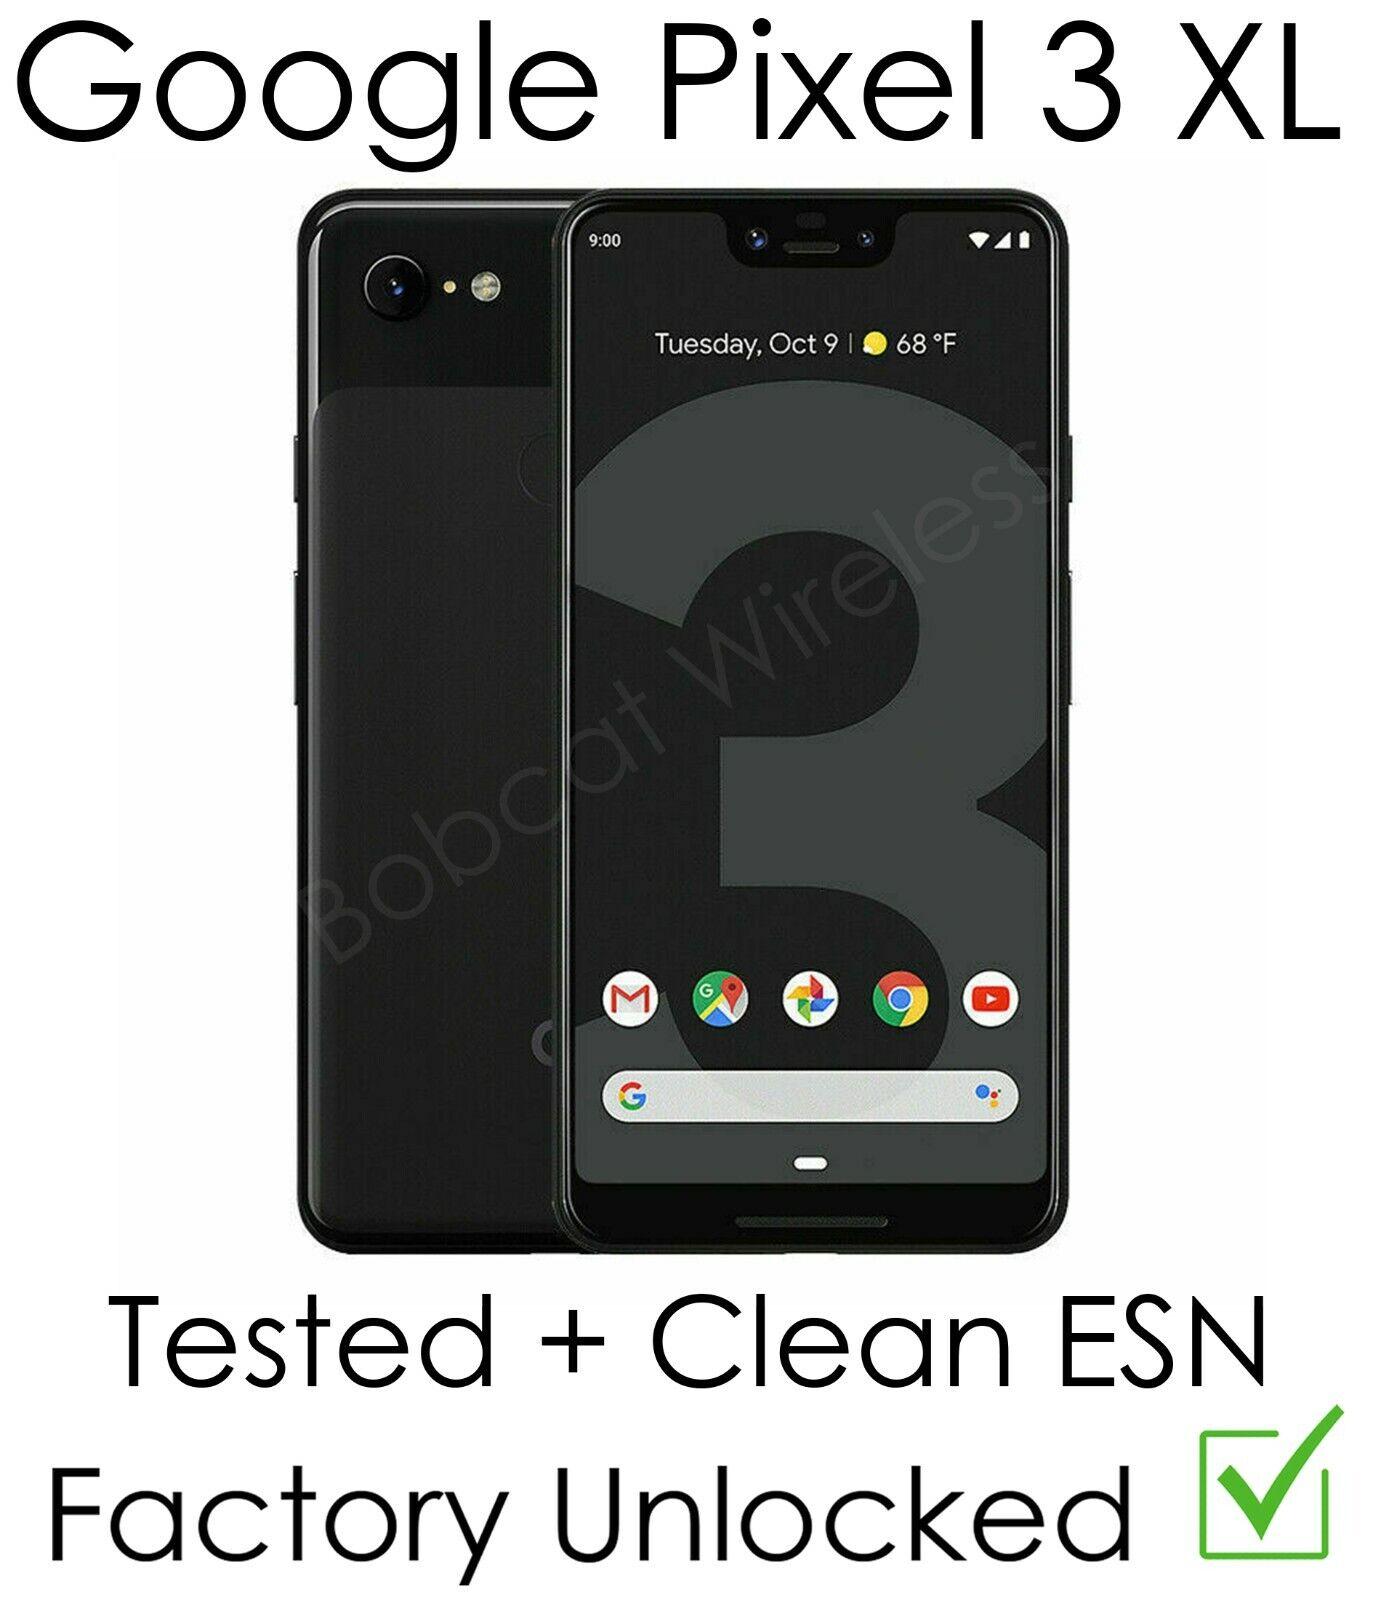 Android Phone - Google Pixel 3 XL Sprint T-Mobile Cricket AT&T Verizon GSM+CDMA Factory Unlocked